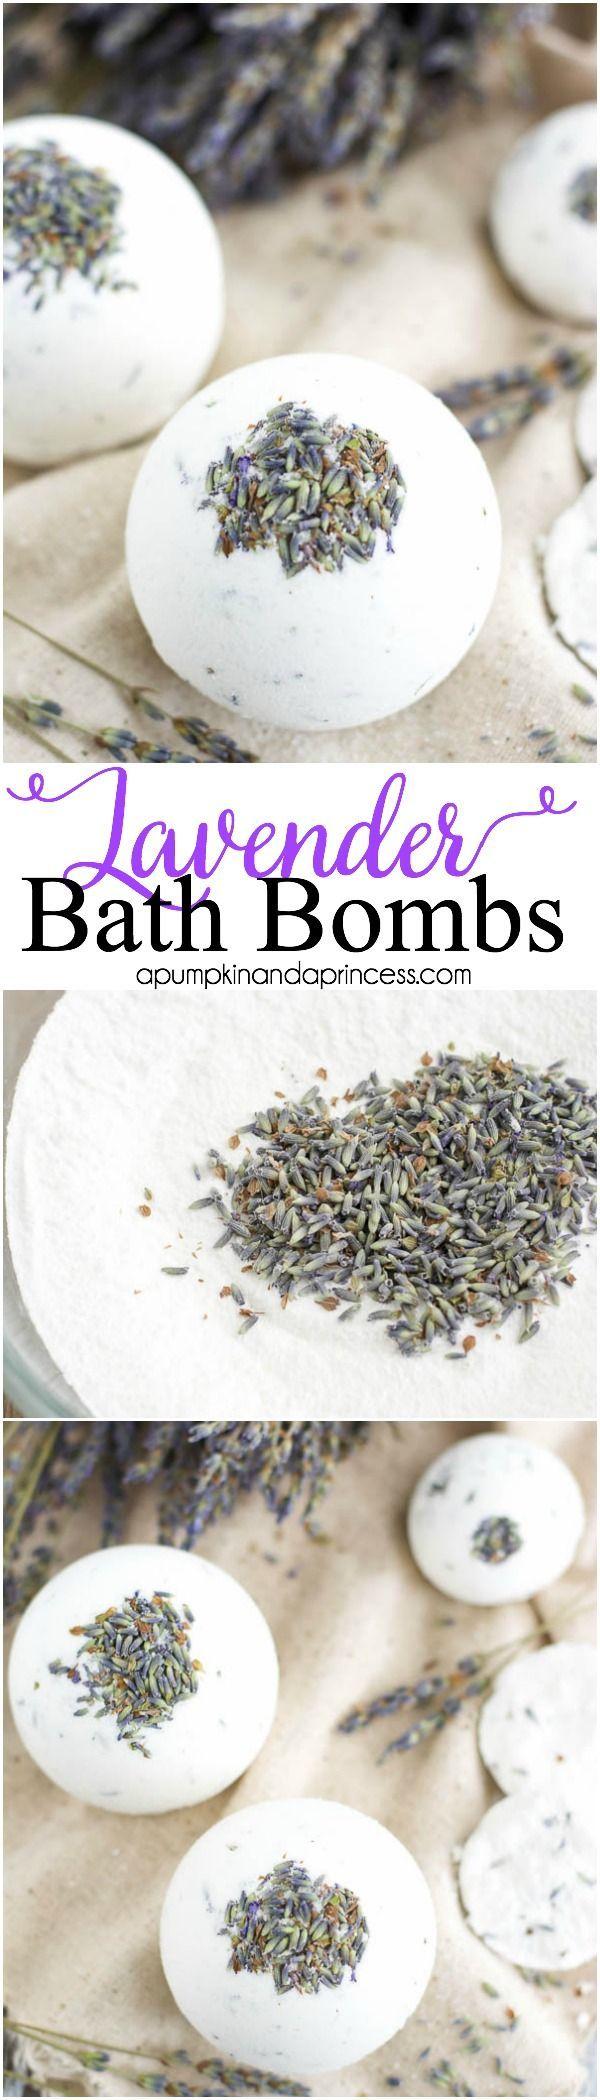 DIY Bath Bombs | Her Campus